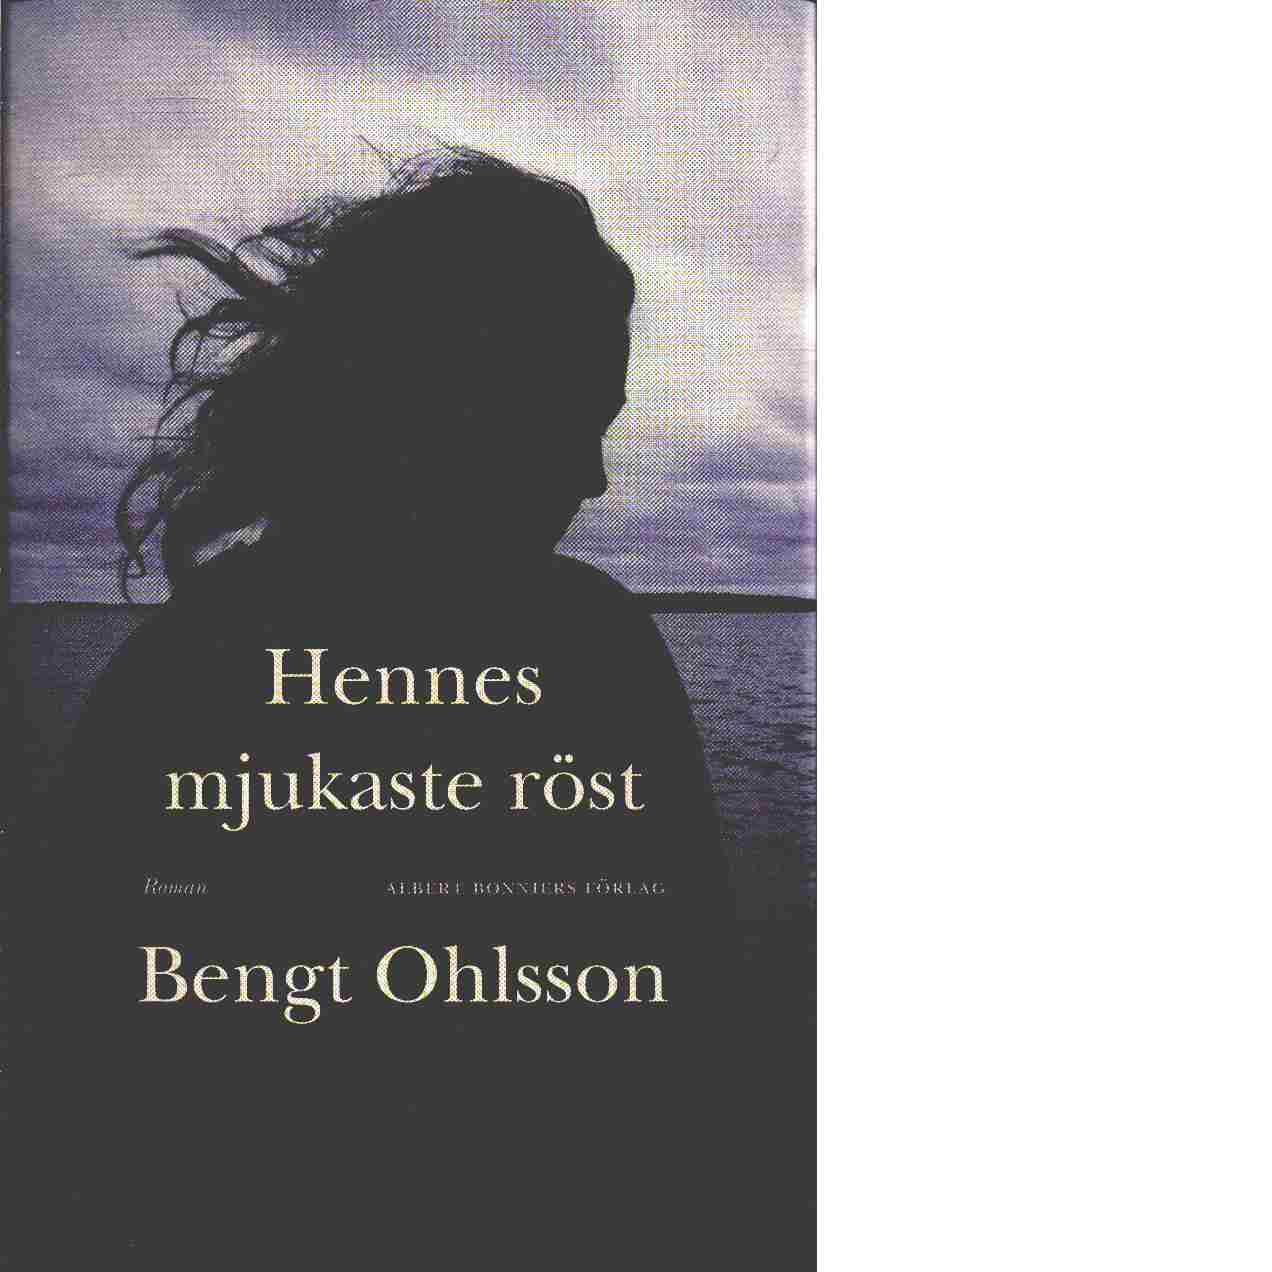 Hennes mjukaste röst - Ohlsson, Bengt